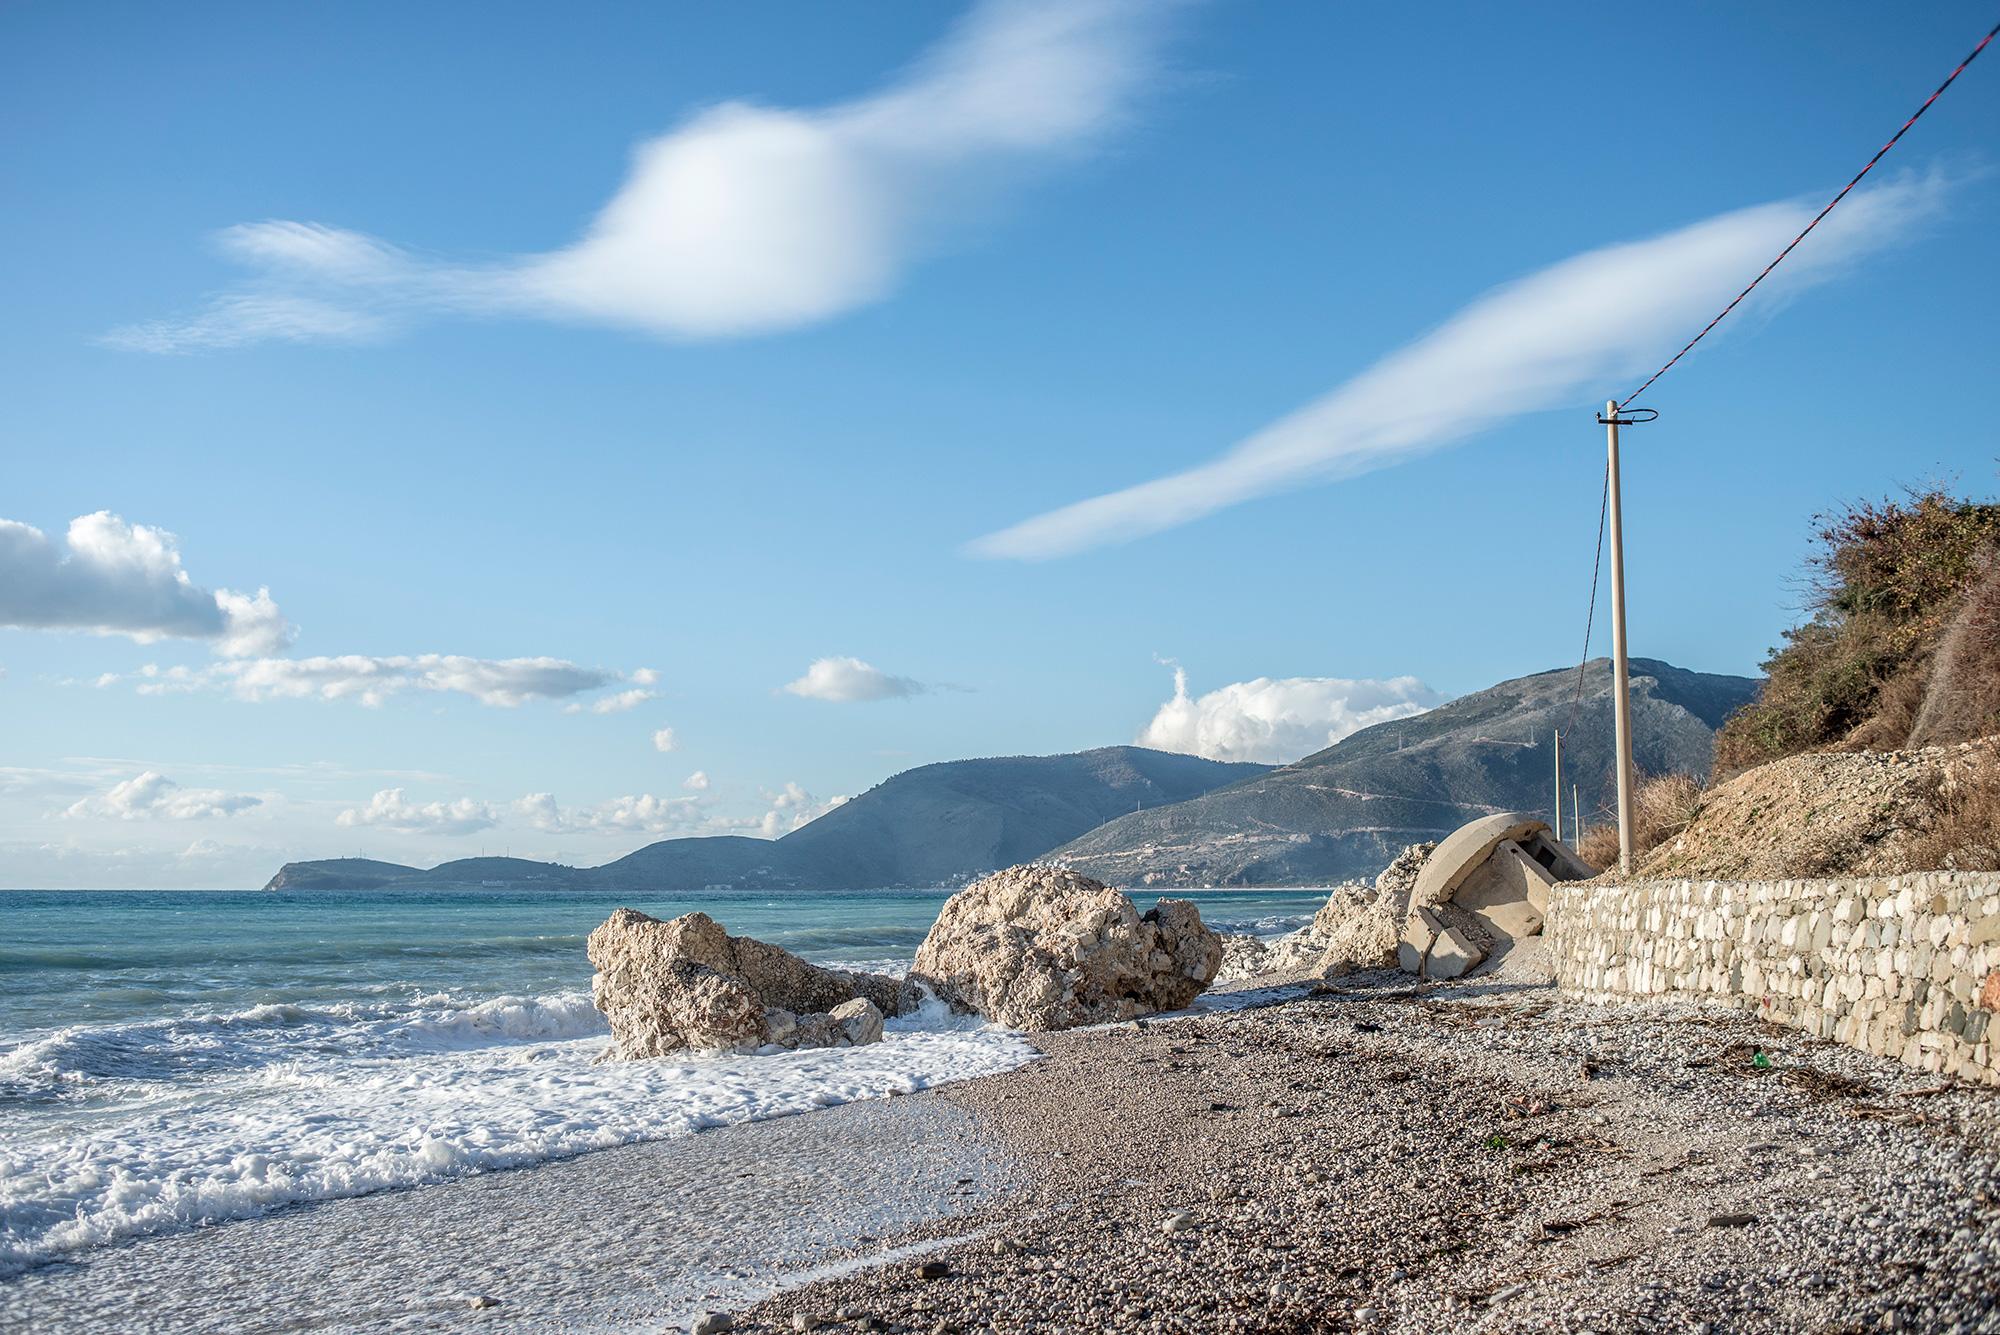 An abandoned bunker on the coast near Borsh, Albania